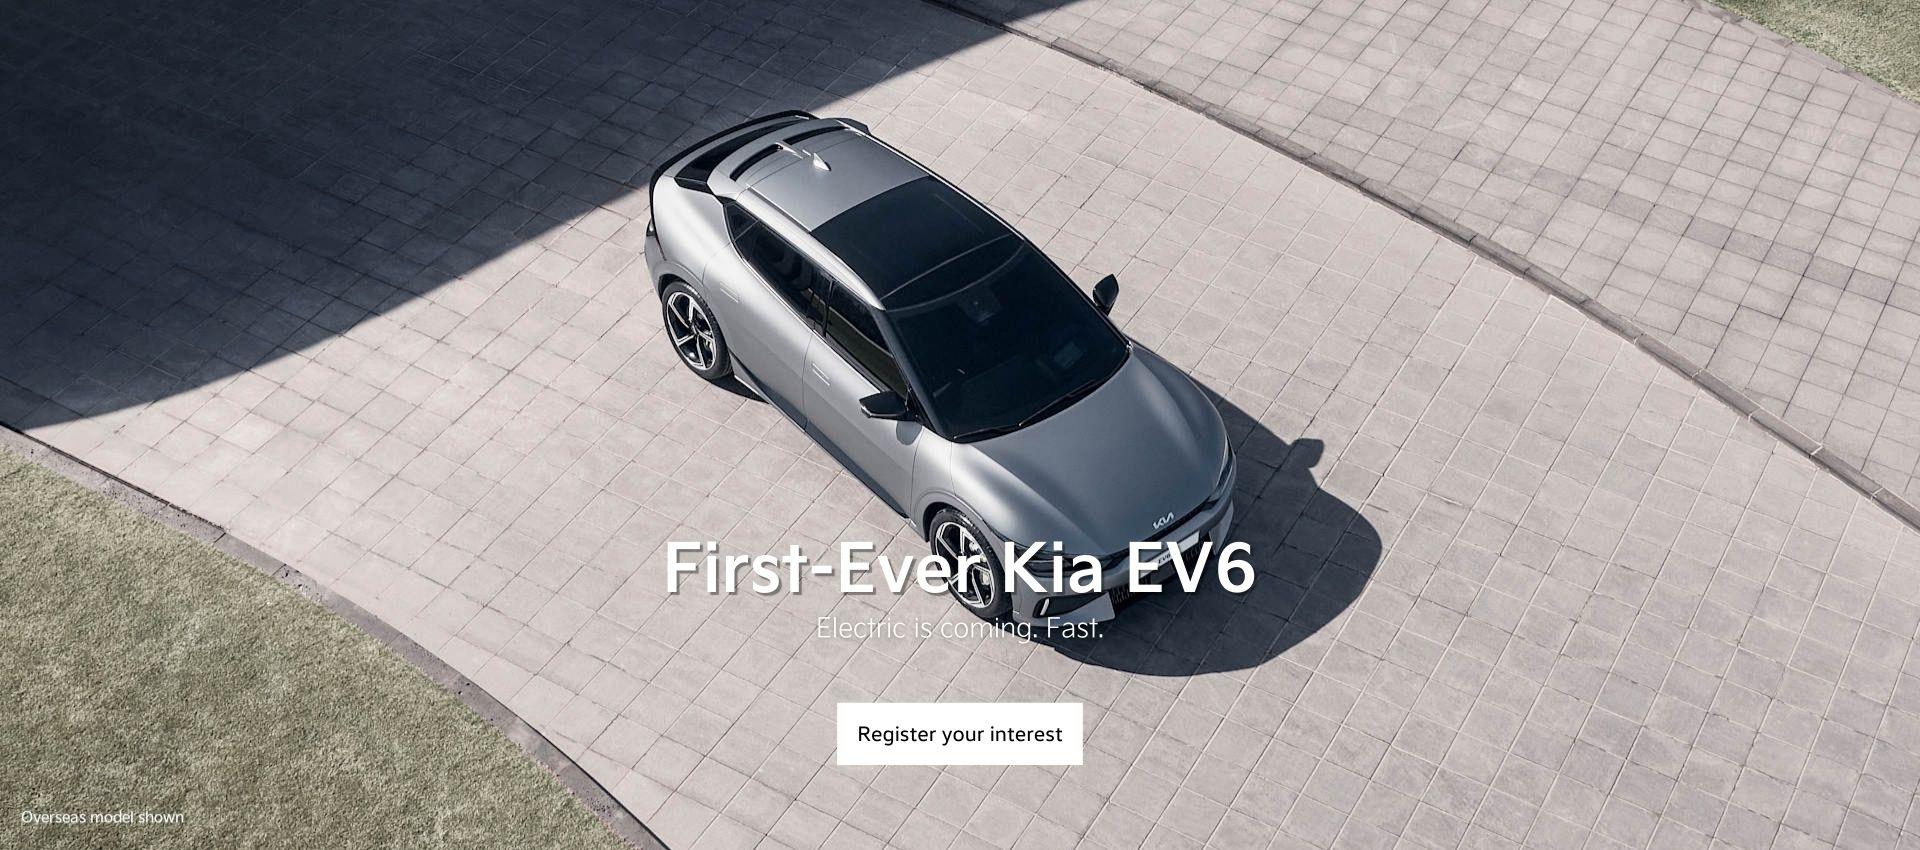 First-Ever Kia EV6